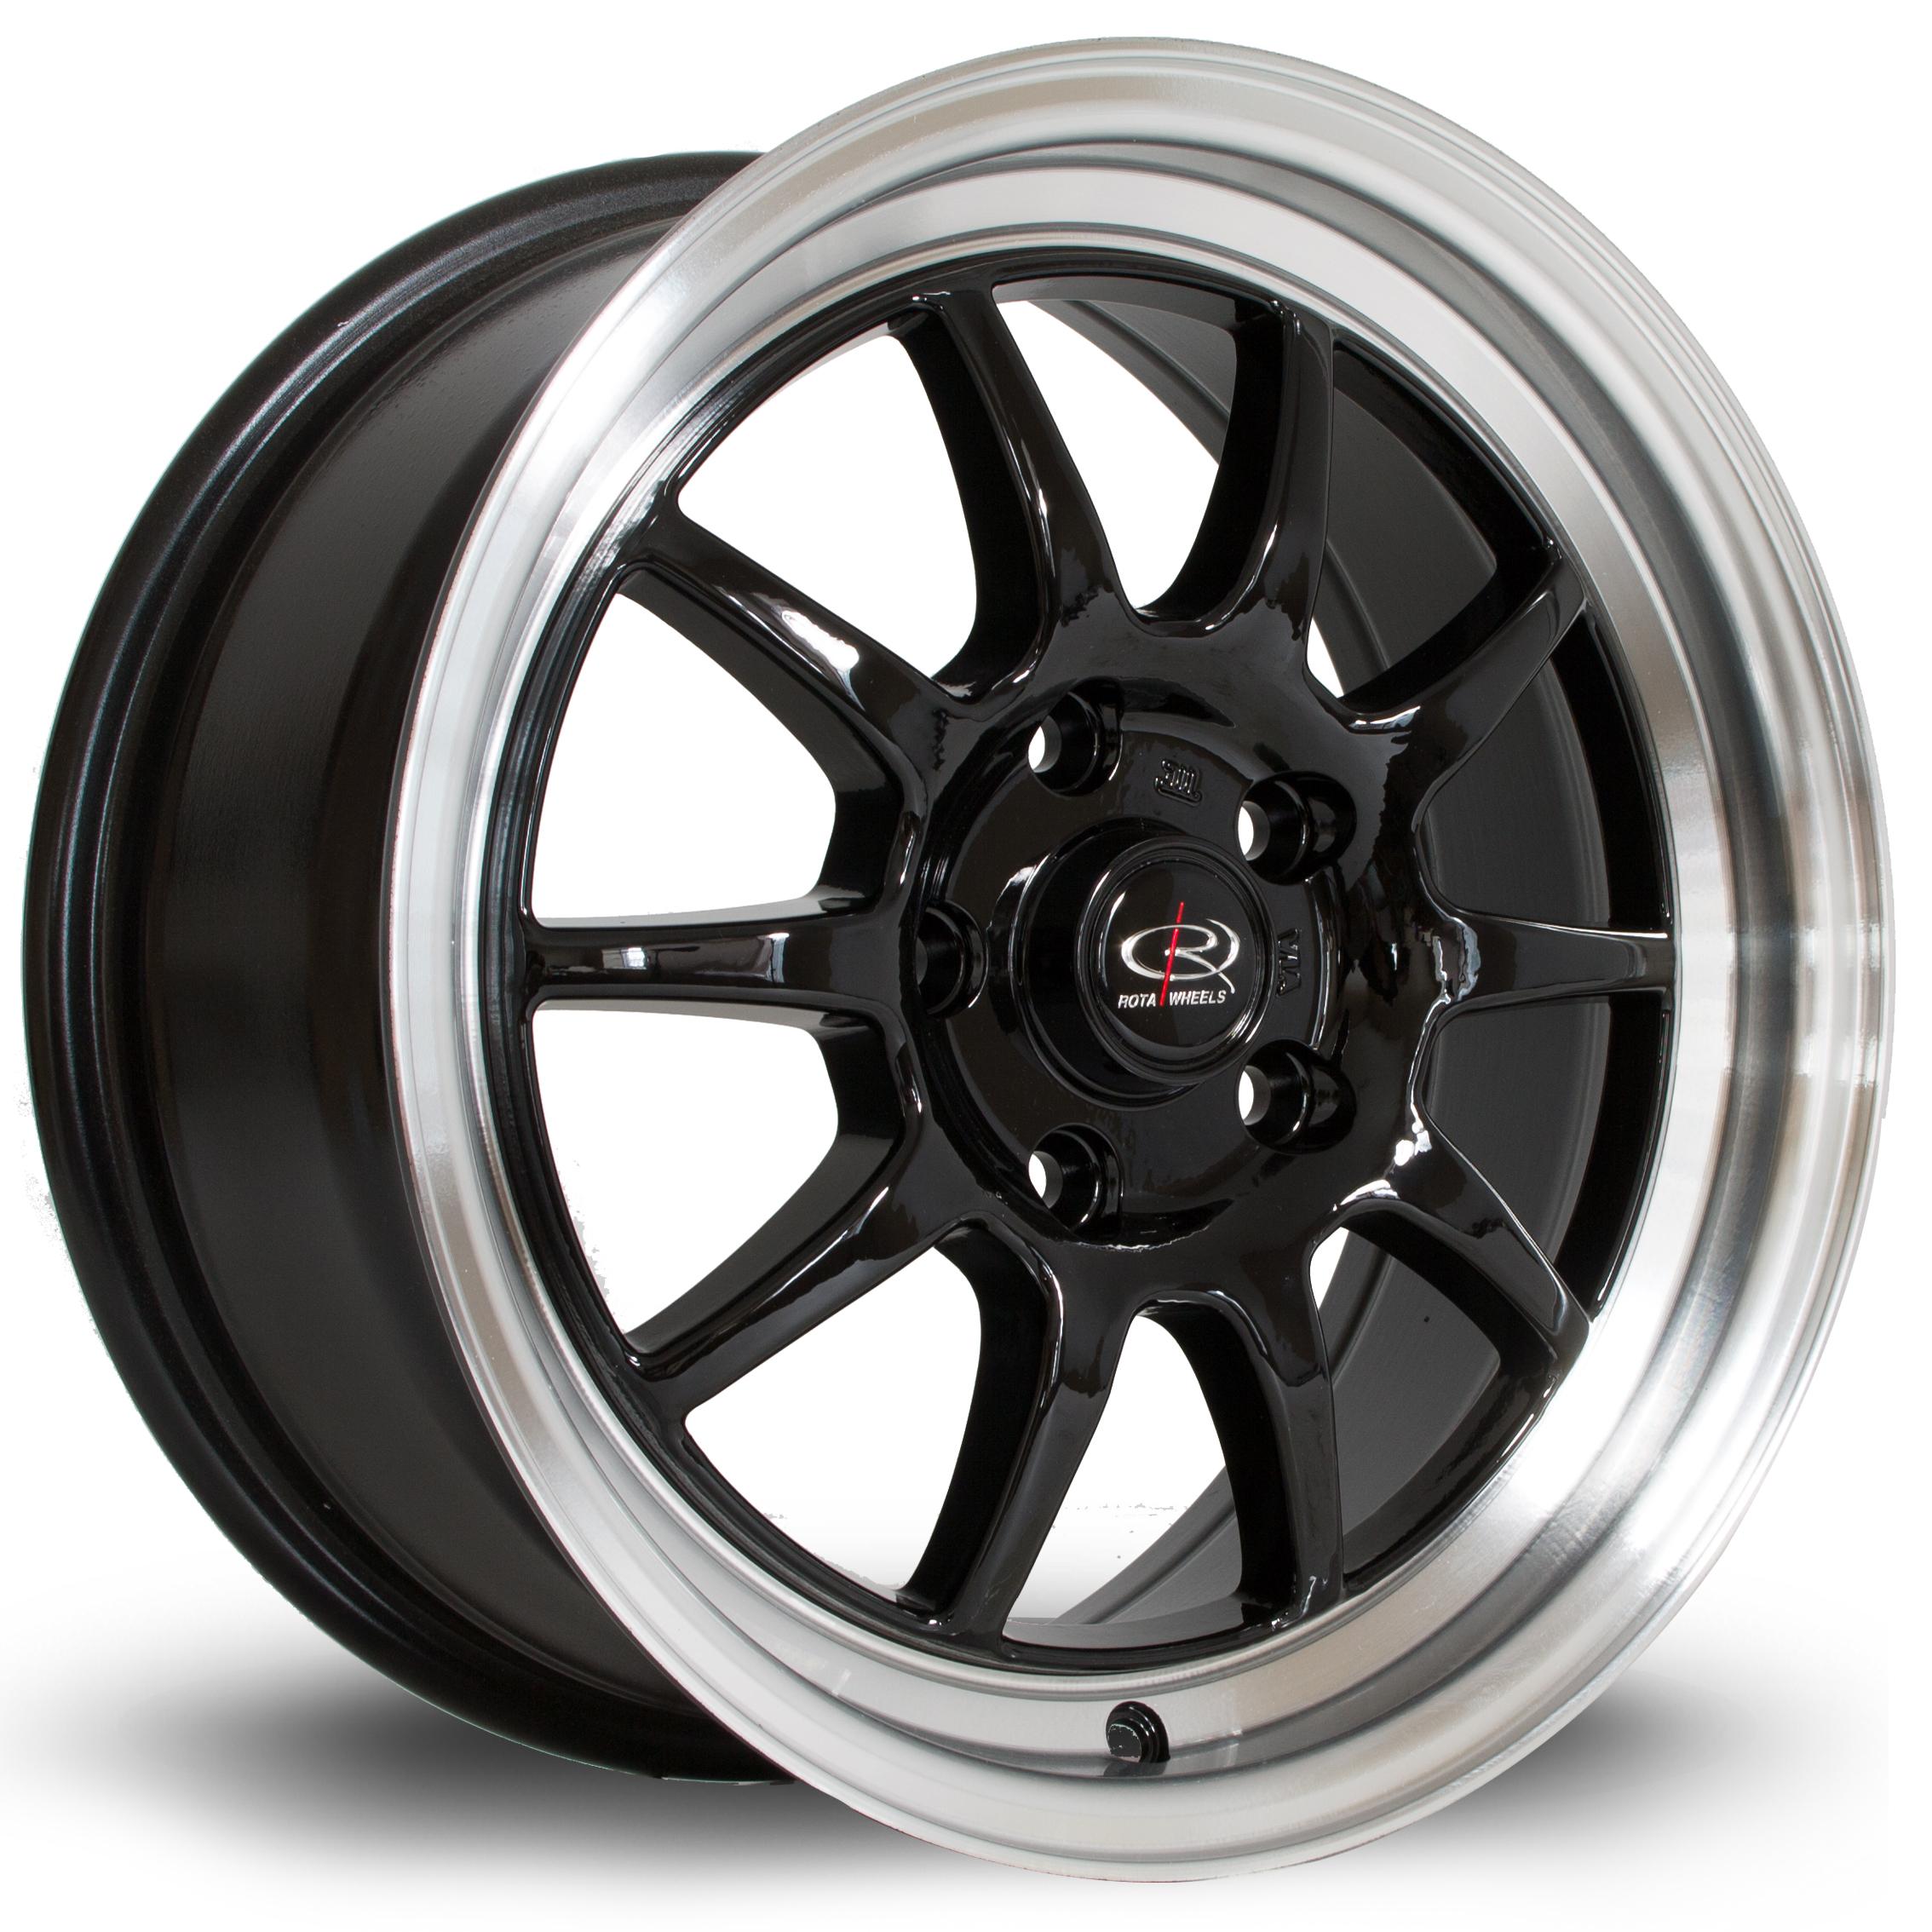 Rota GT3 wheels